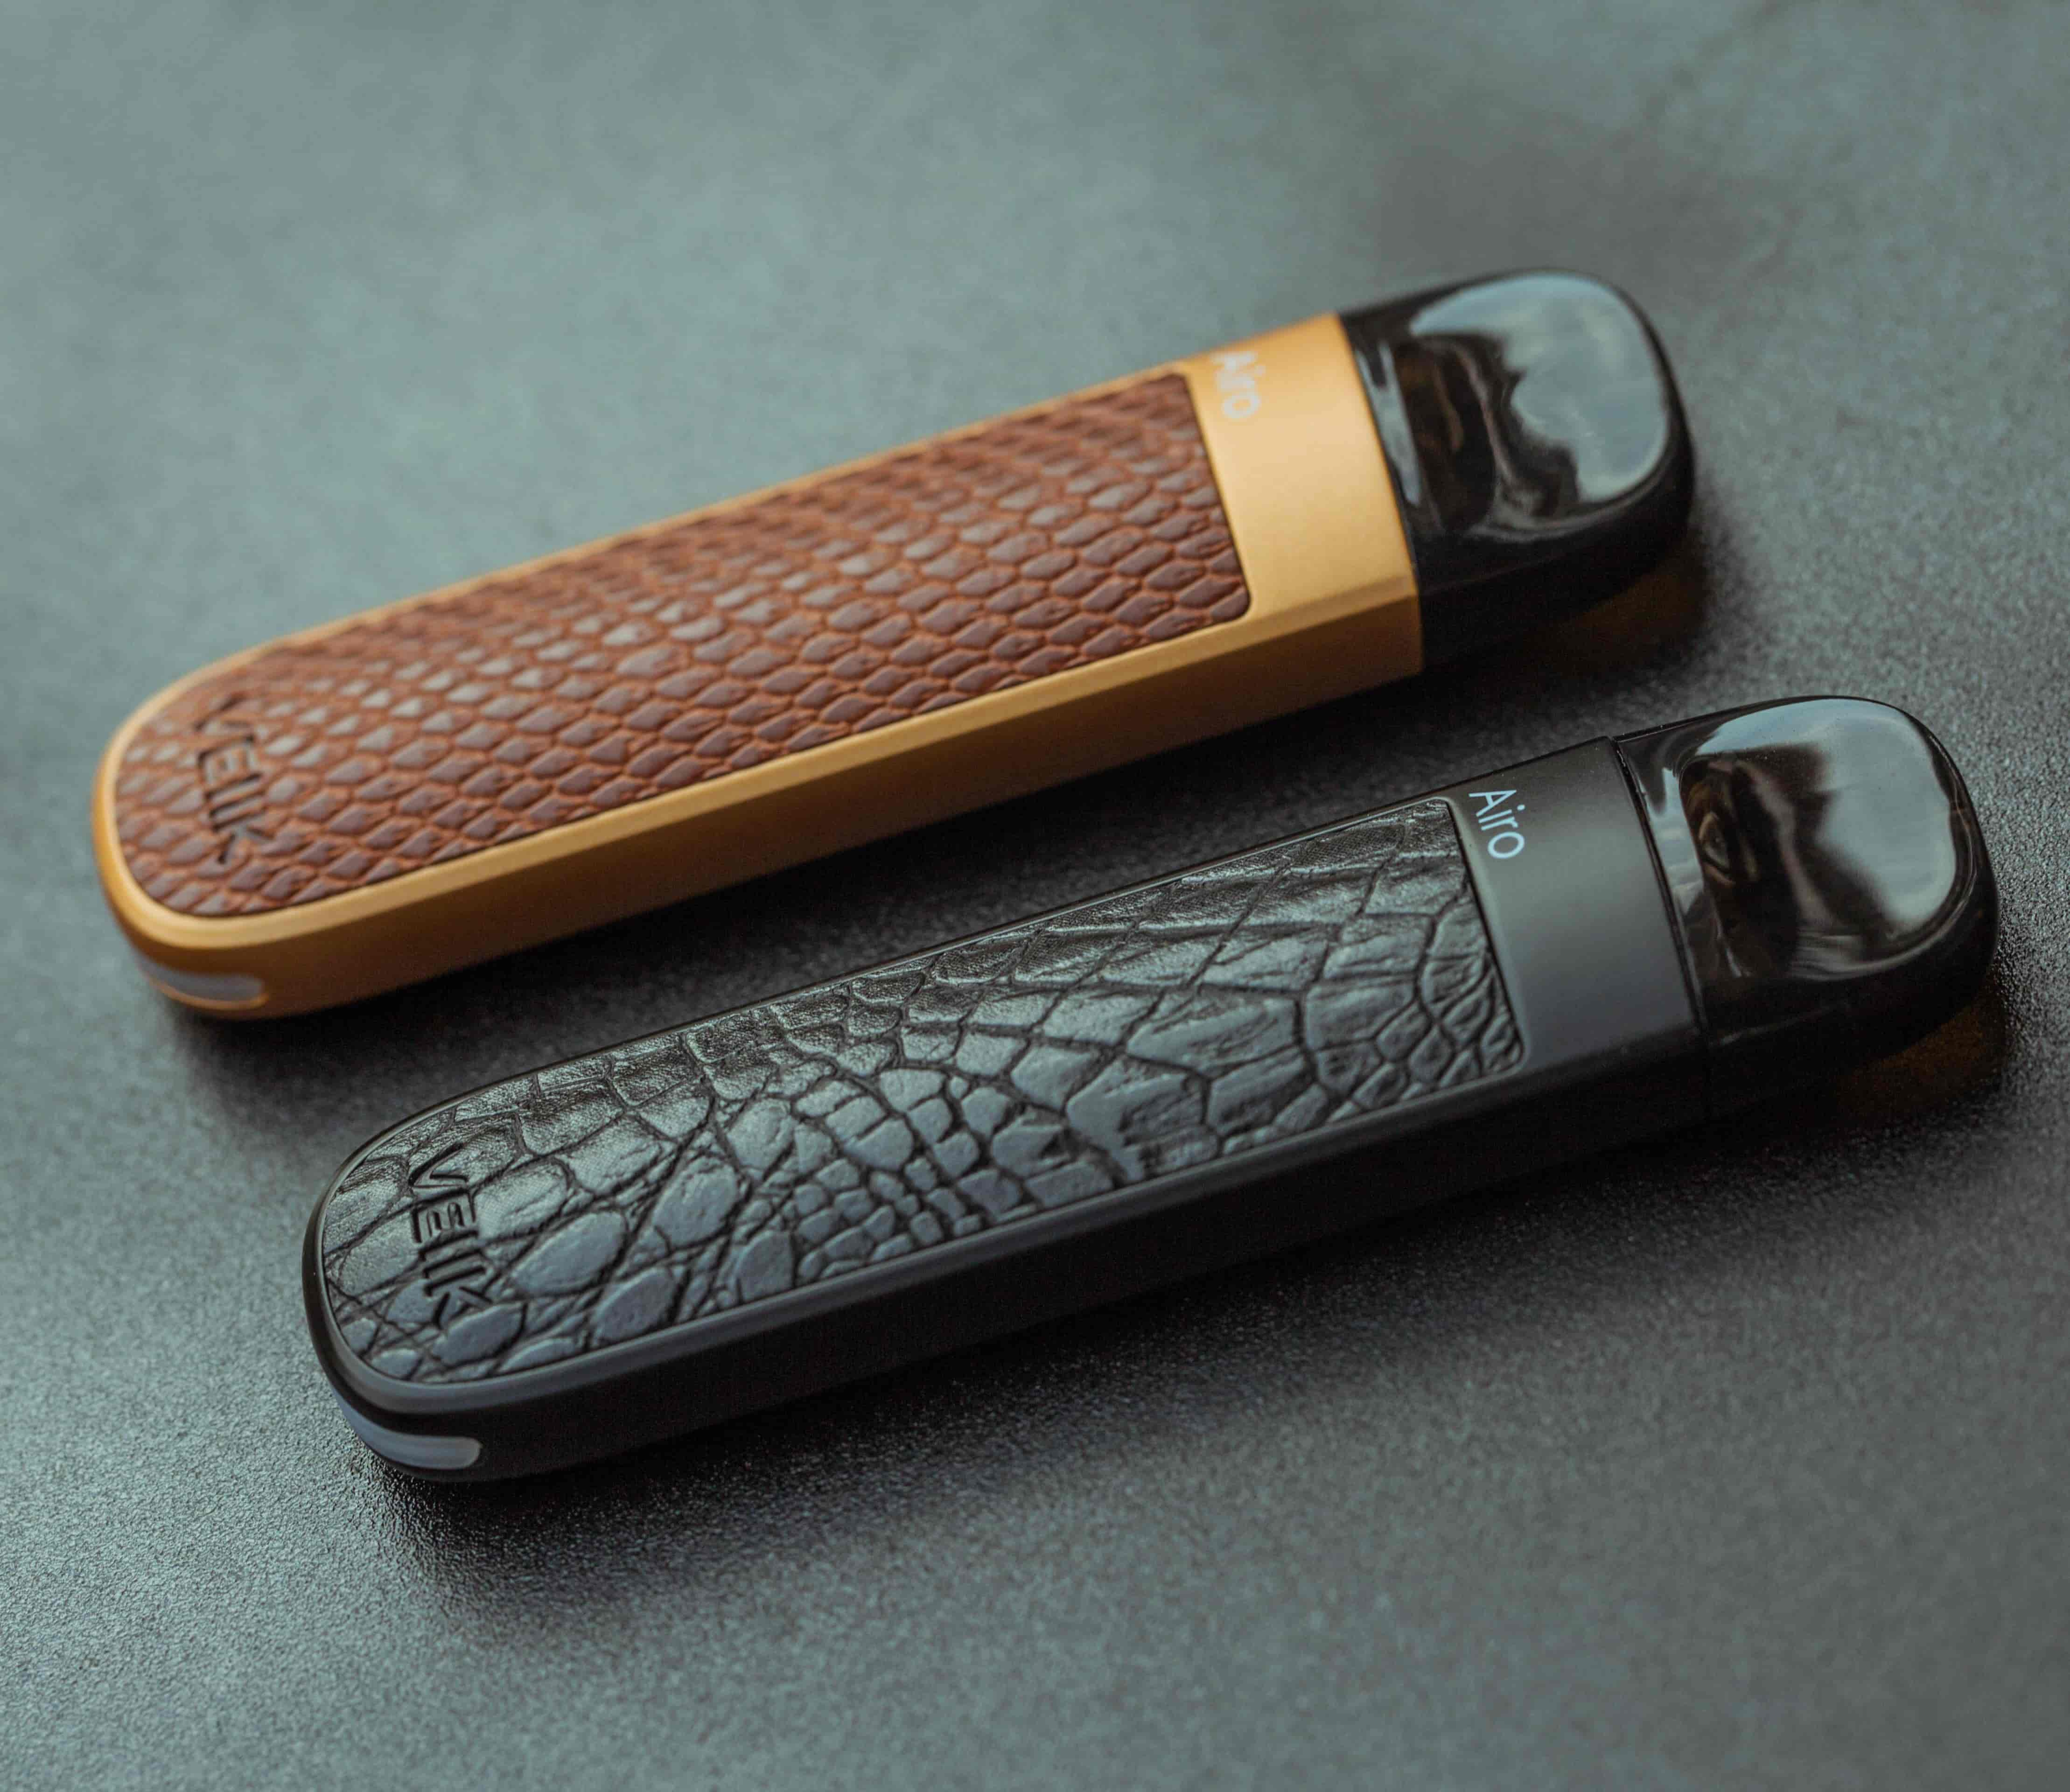 VEIIK AIRO Upgraded Leather Limited version pod kit